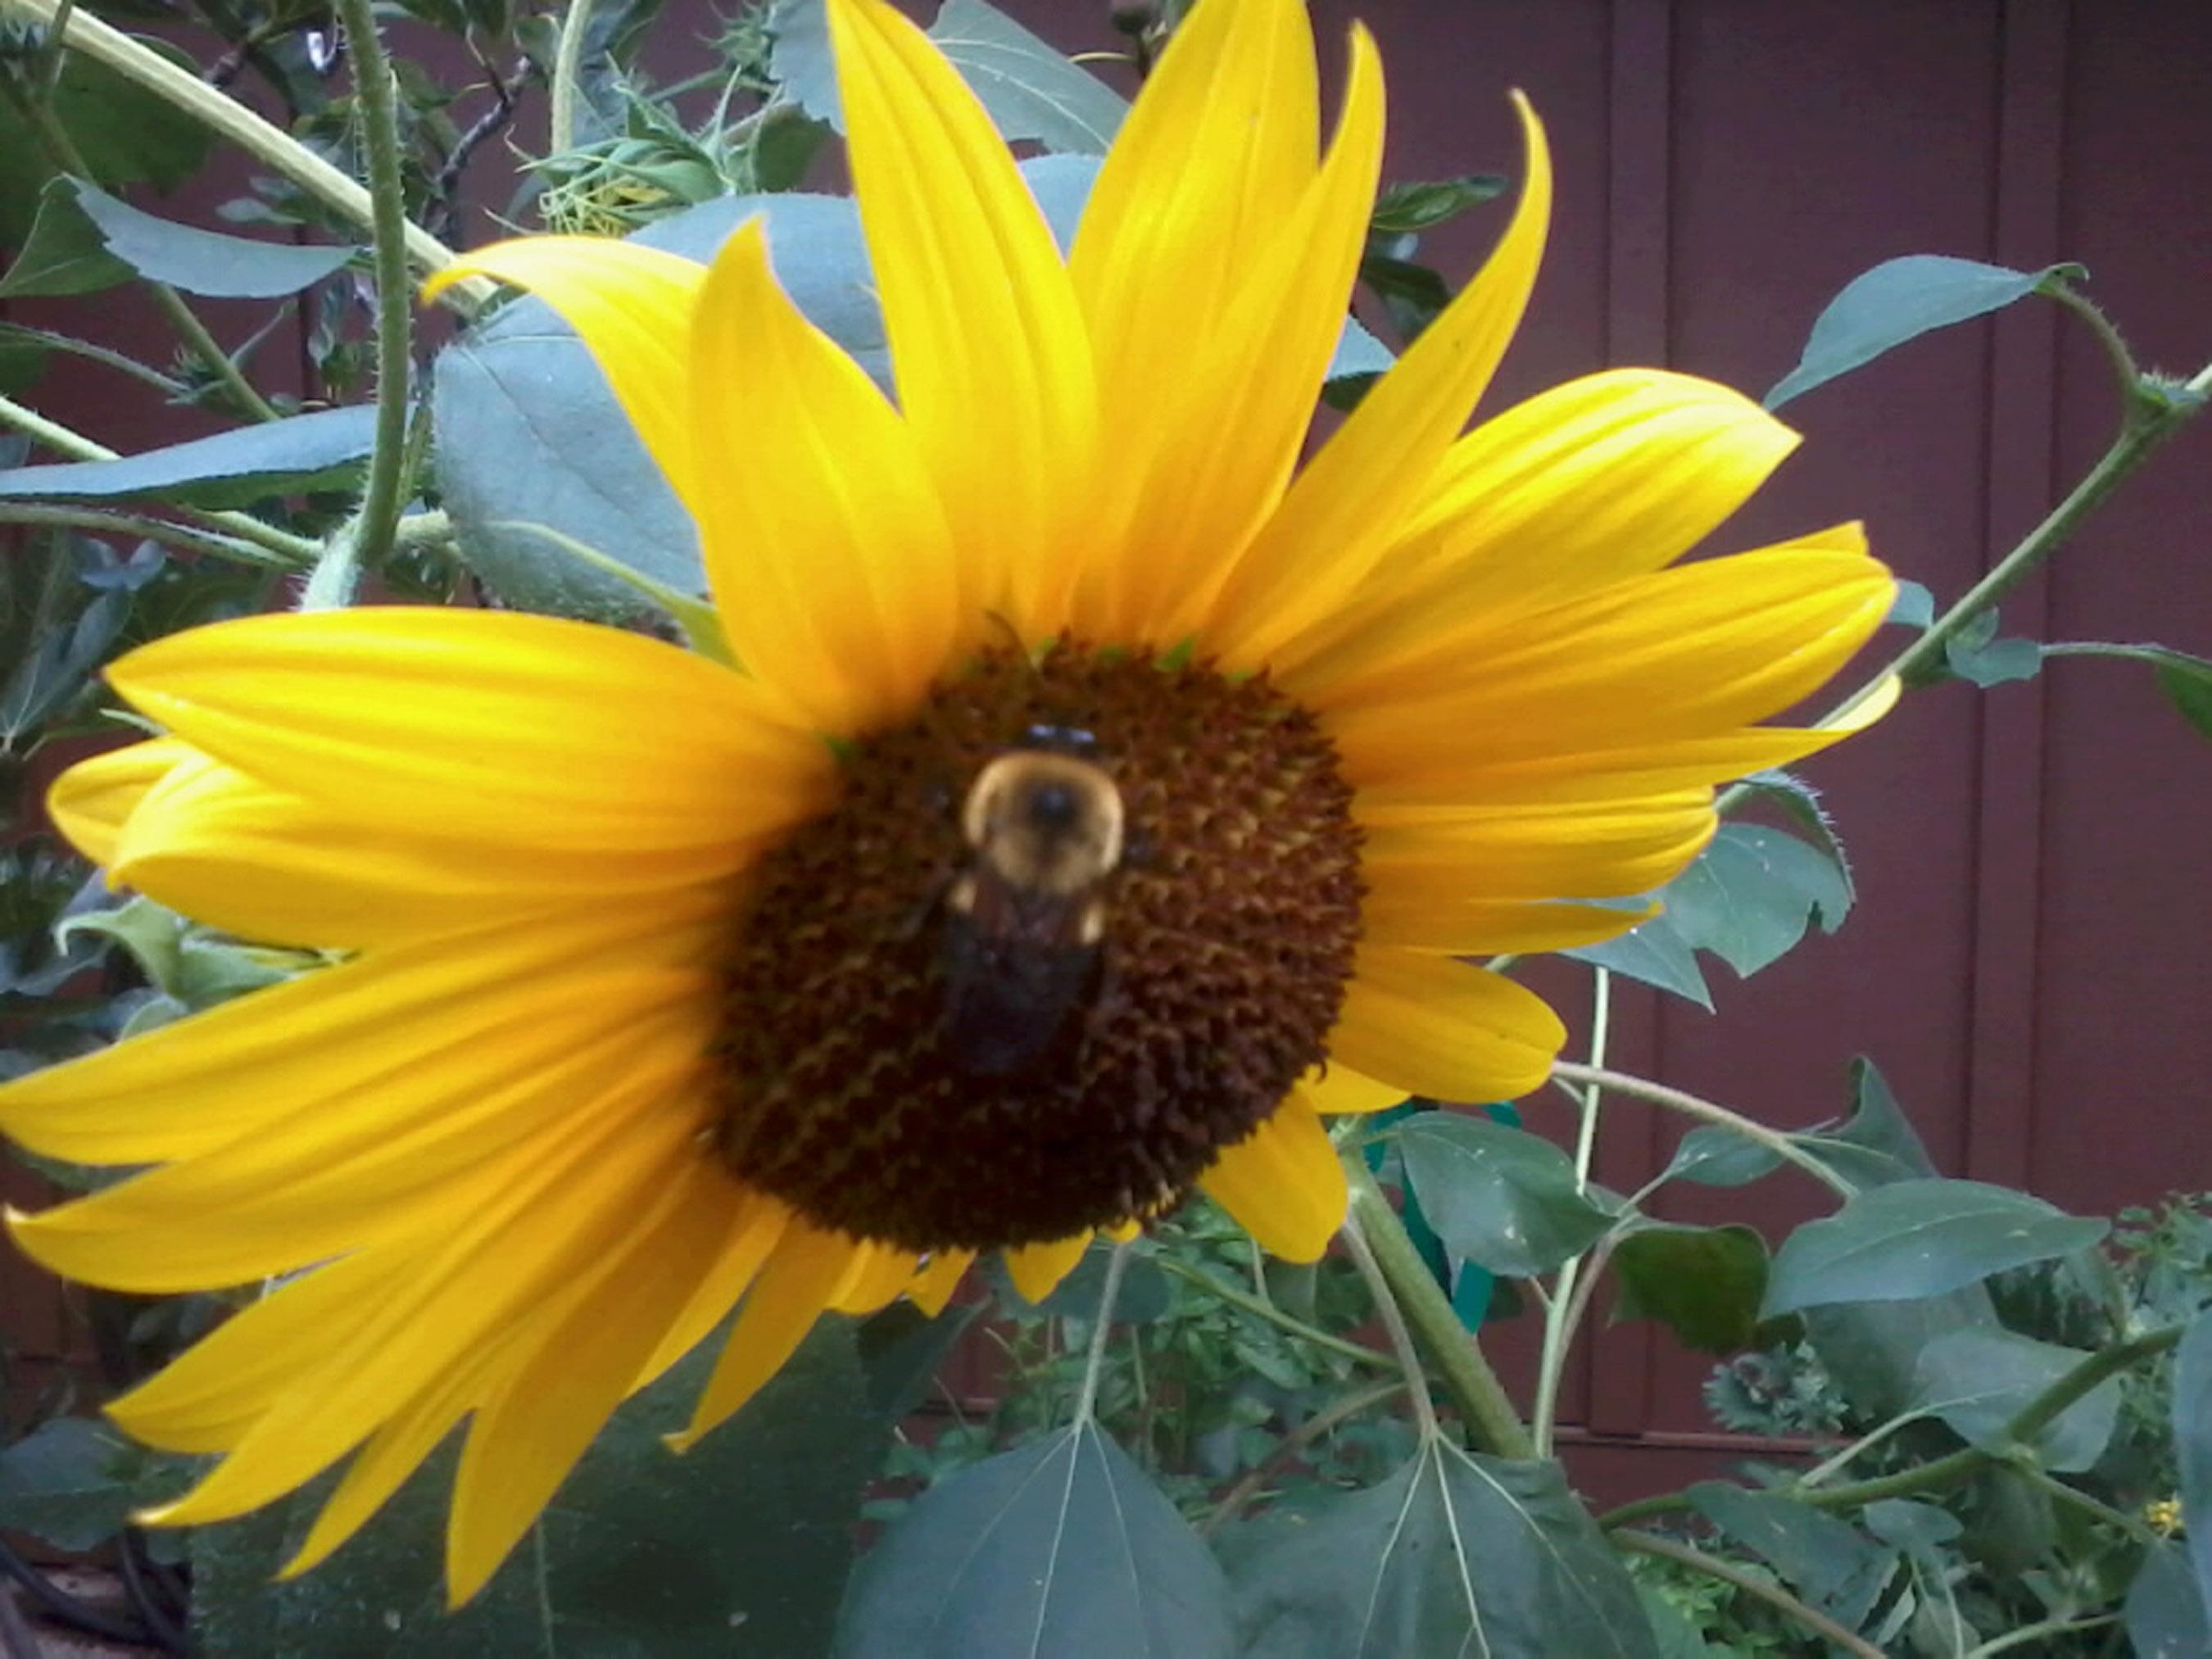 Bumblebee on Sunflower on Shanahan Ridge